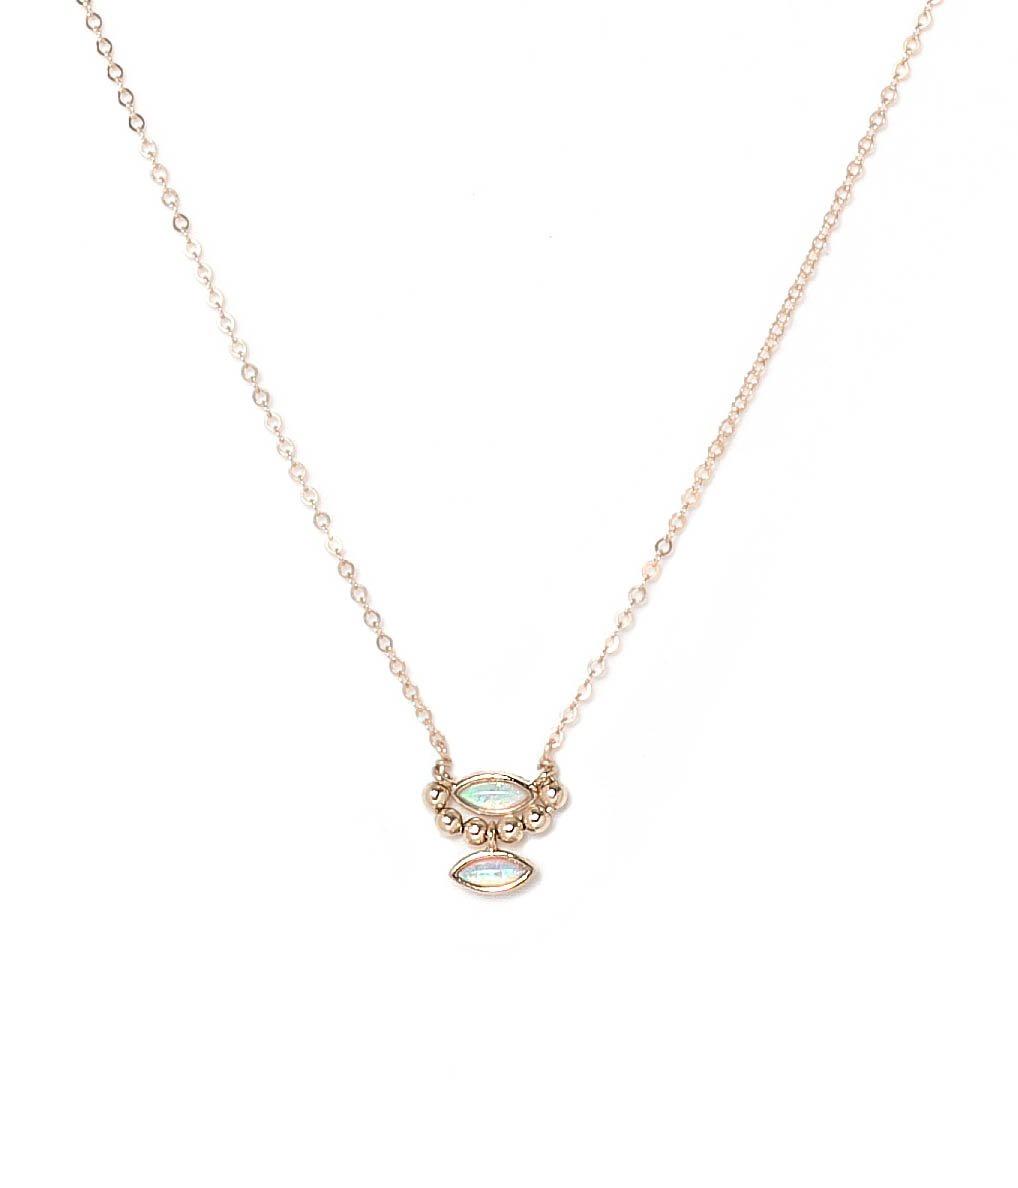 Gold Alastar Necklace